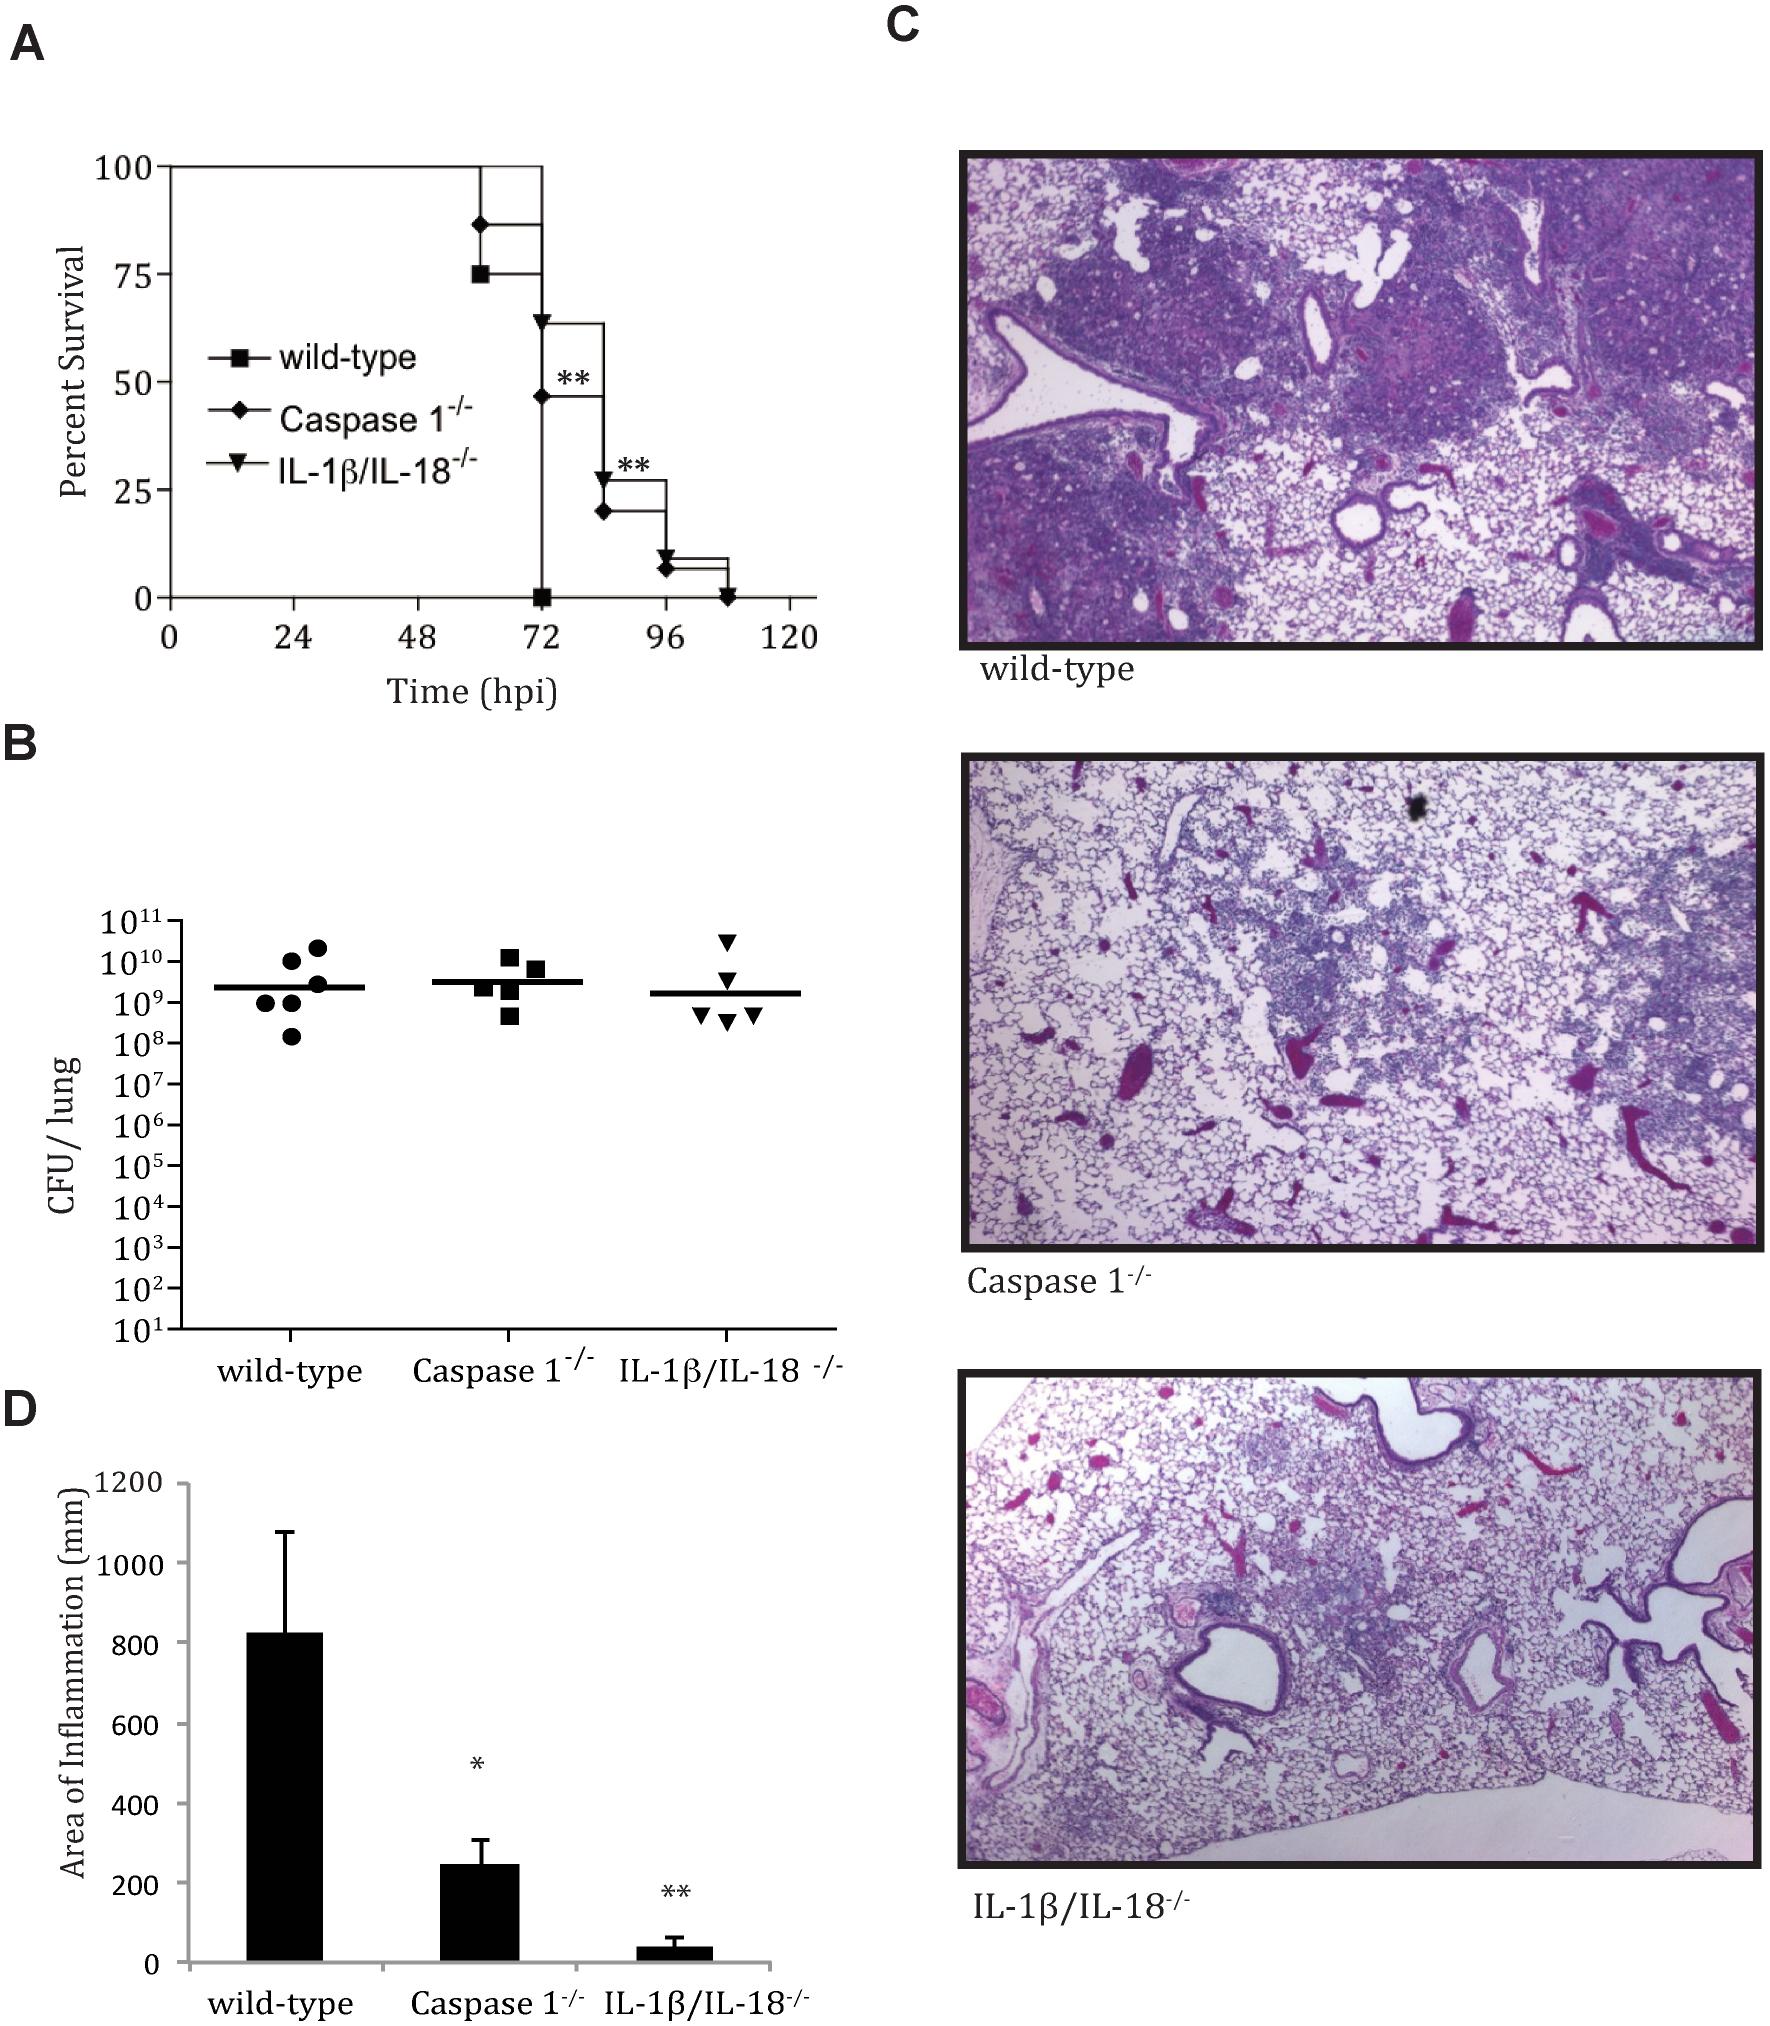 IL-1β/IL-18 cytokine activation contributes to pathology of pneumonic plague.